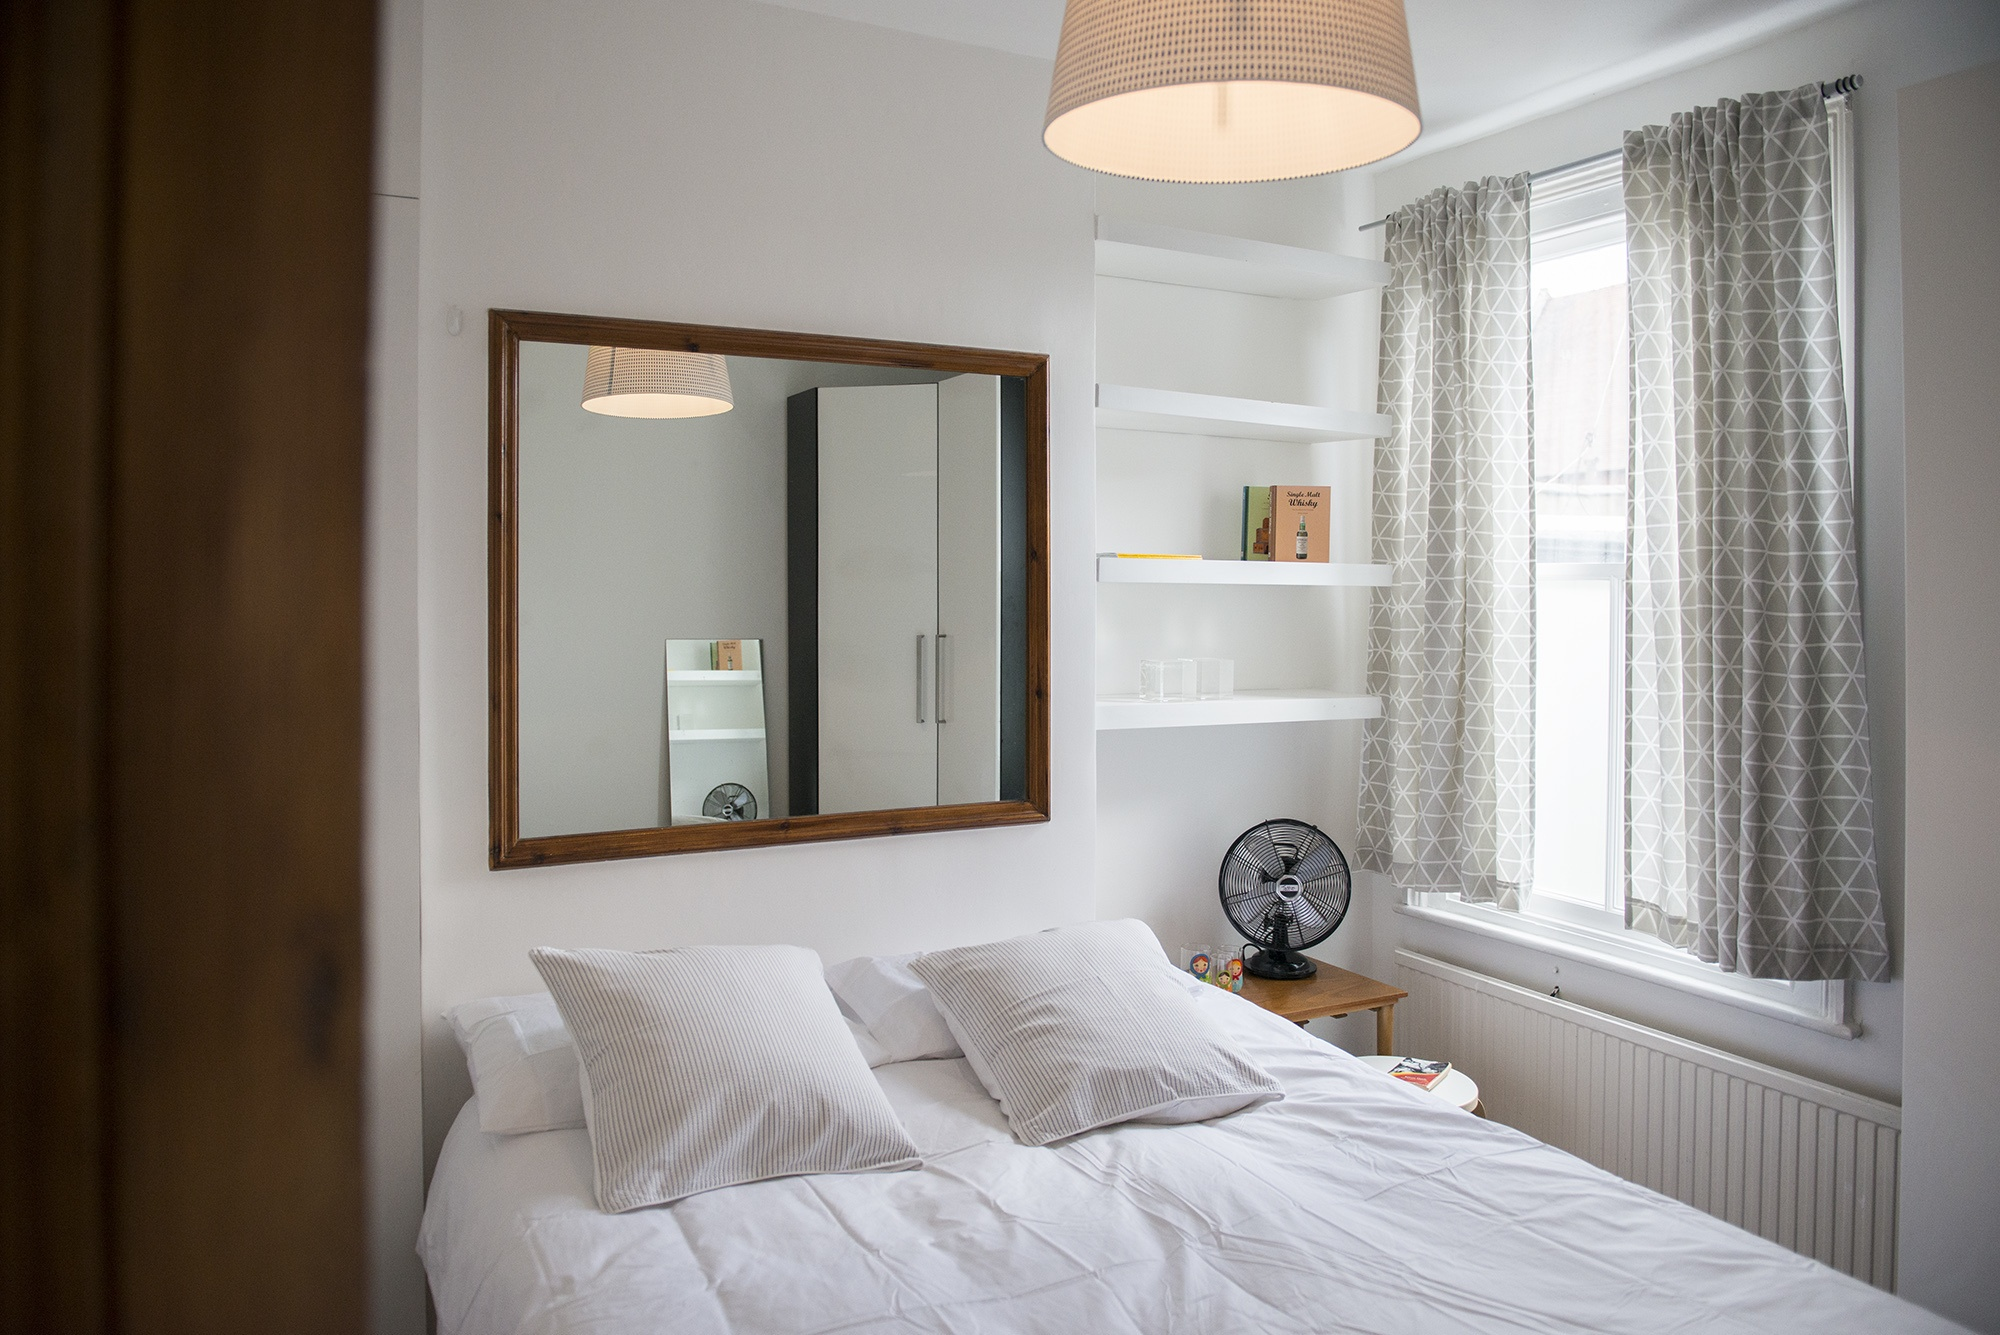 Bed002.jpg